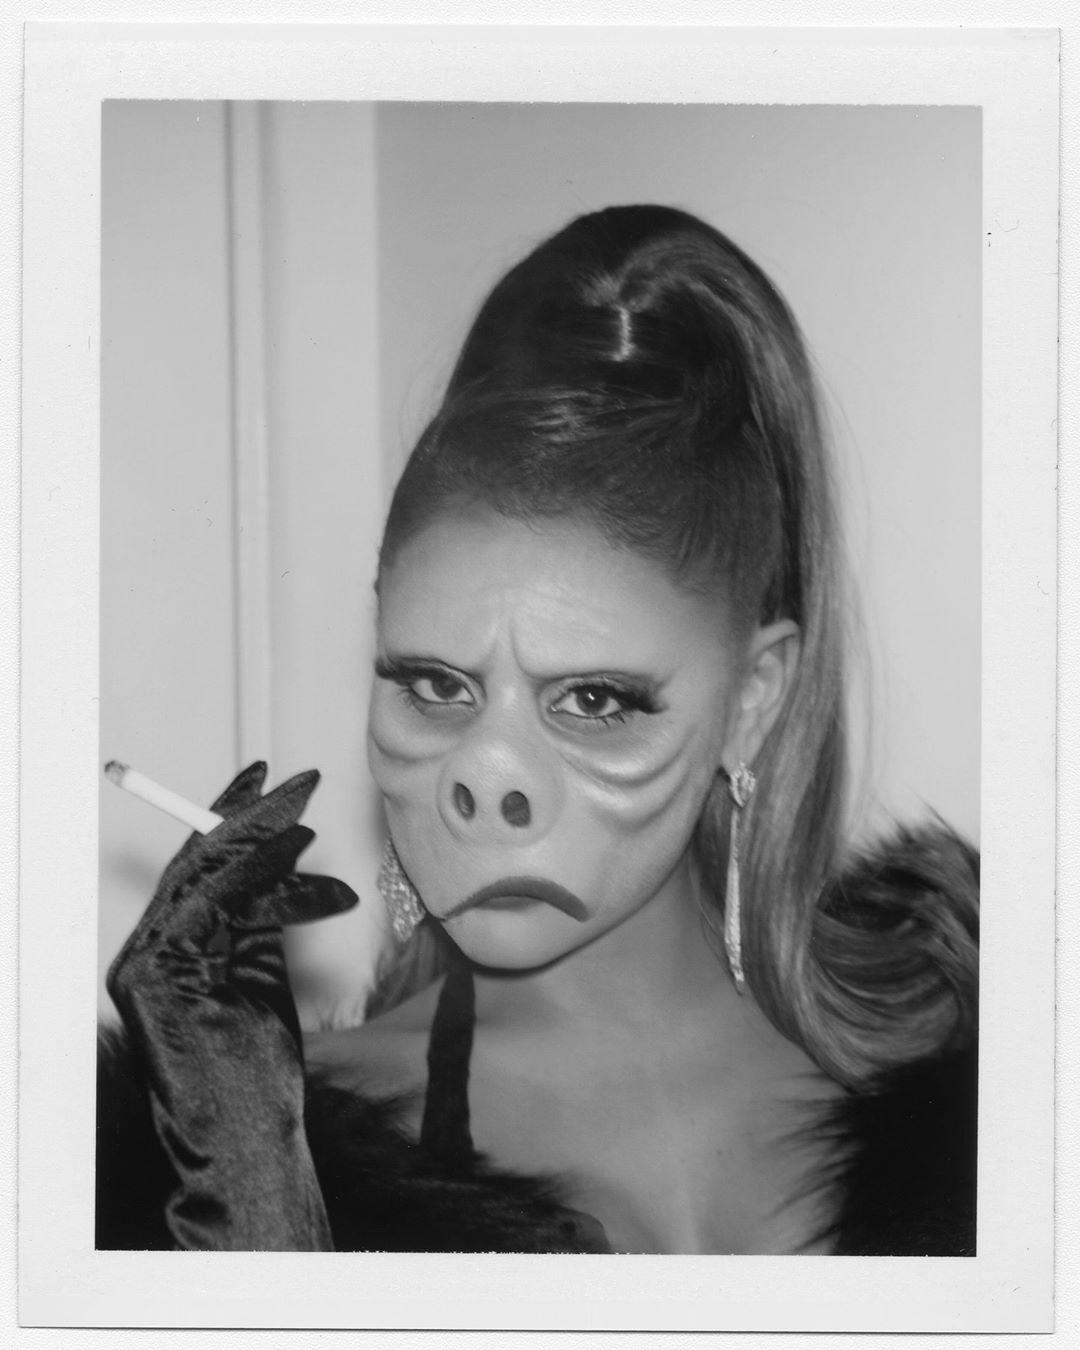 trang phục Halloween - Ariana Grande Halloween 2019